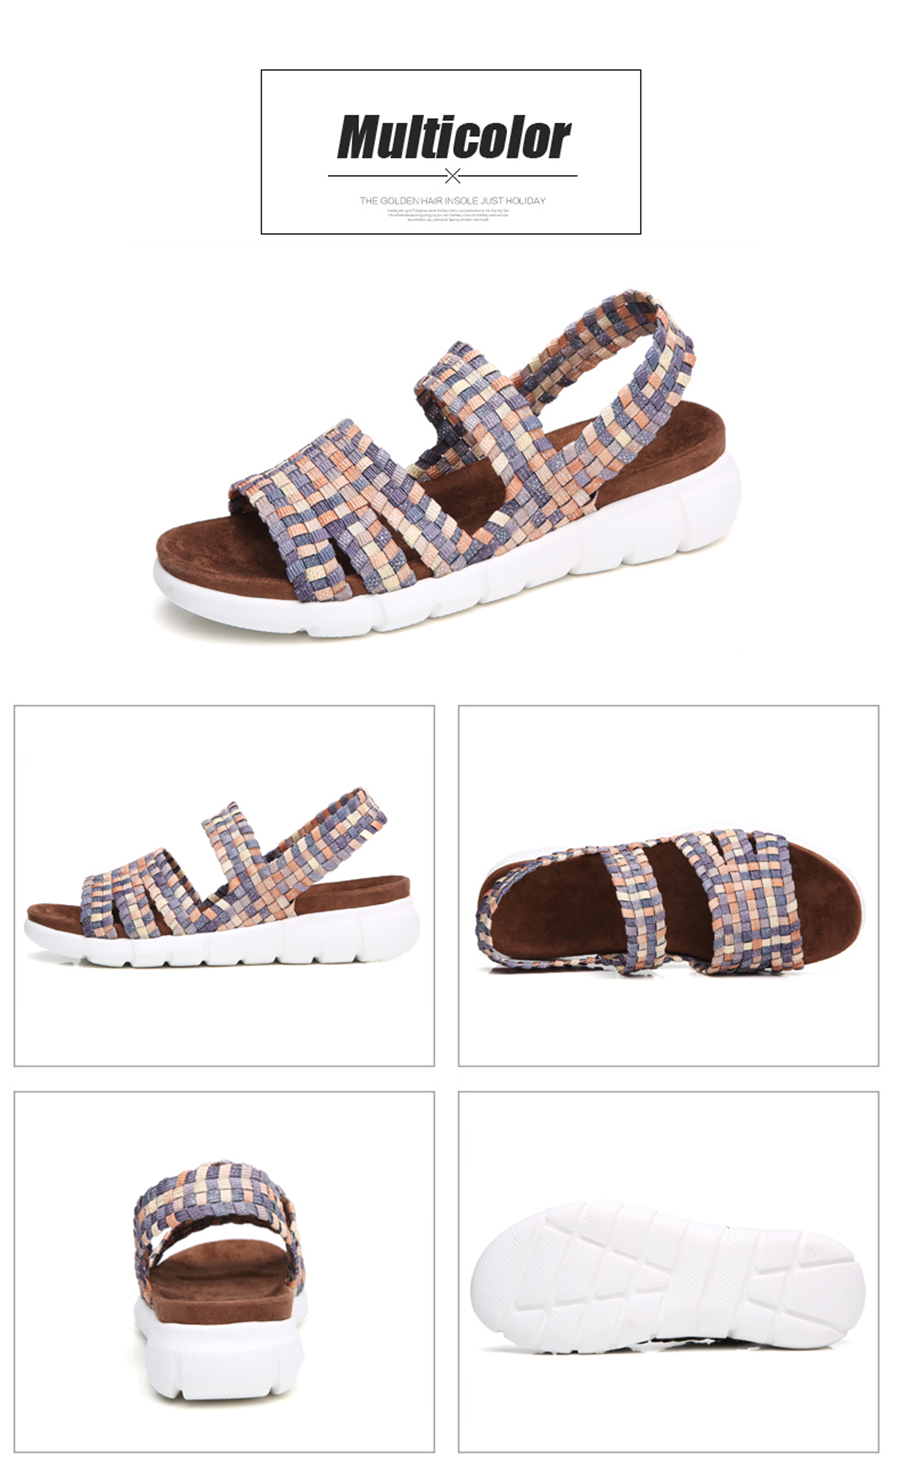 HTB1NDl8guuSBuNjy1Xcq6AYjFXaV STQ 2019 women flat sandals shoes women woven wedge sandals ladies beach summer slingback sandals flipflops jelly shoes 803